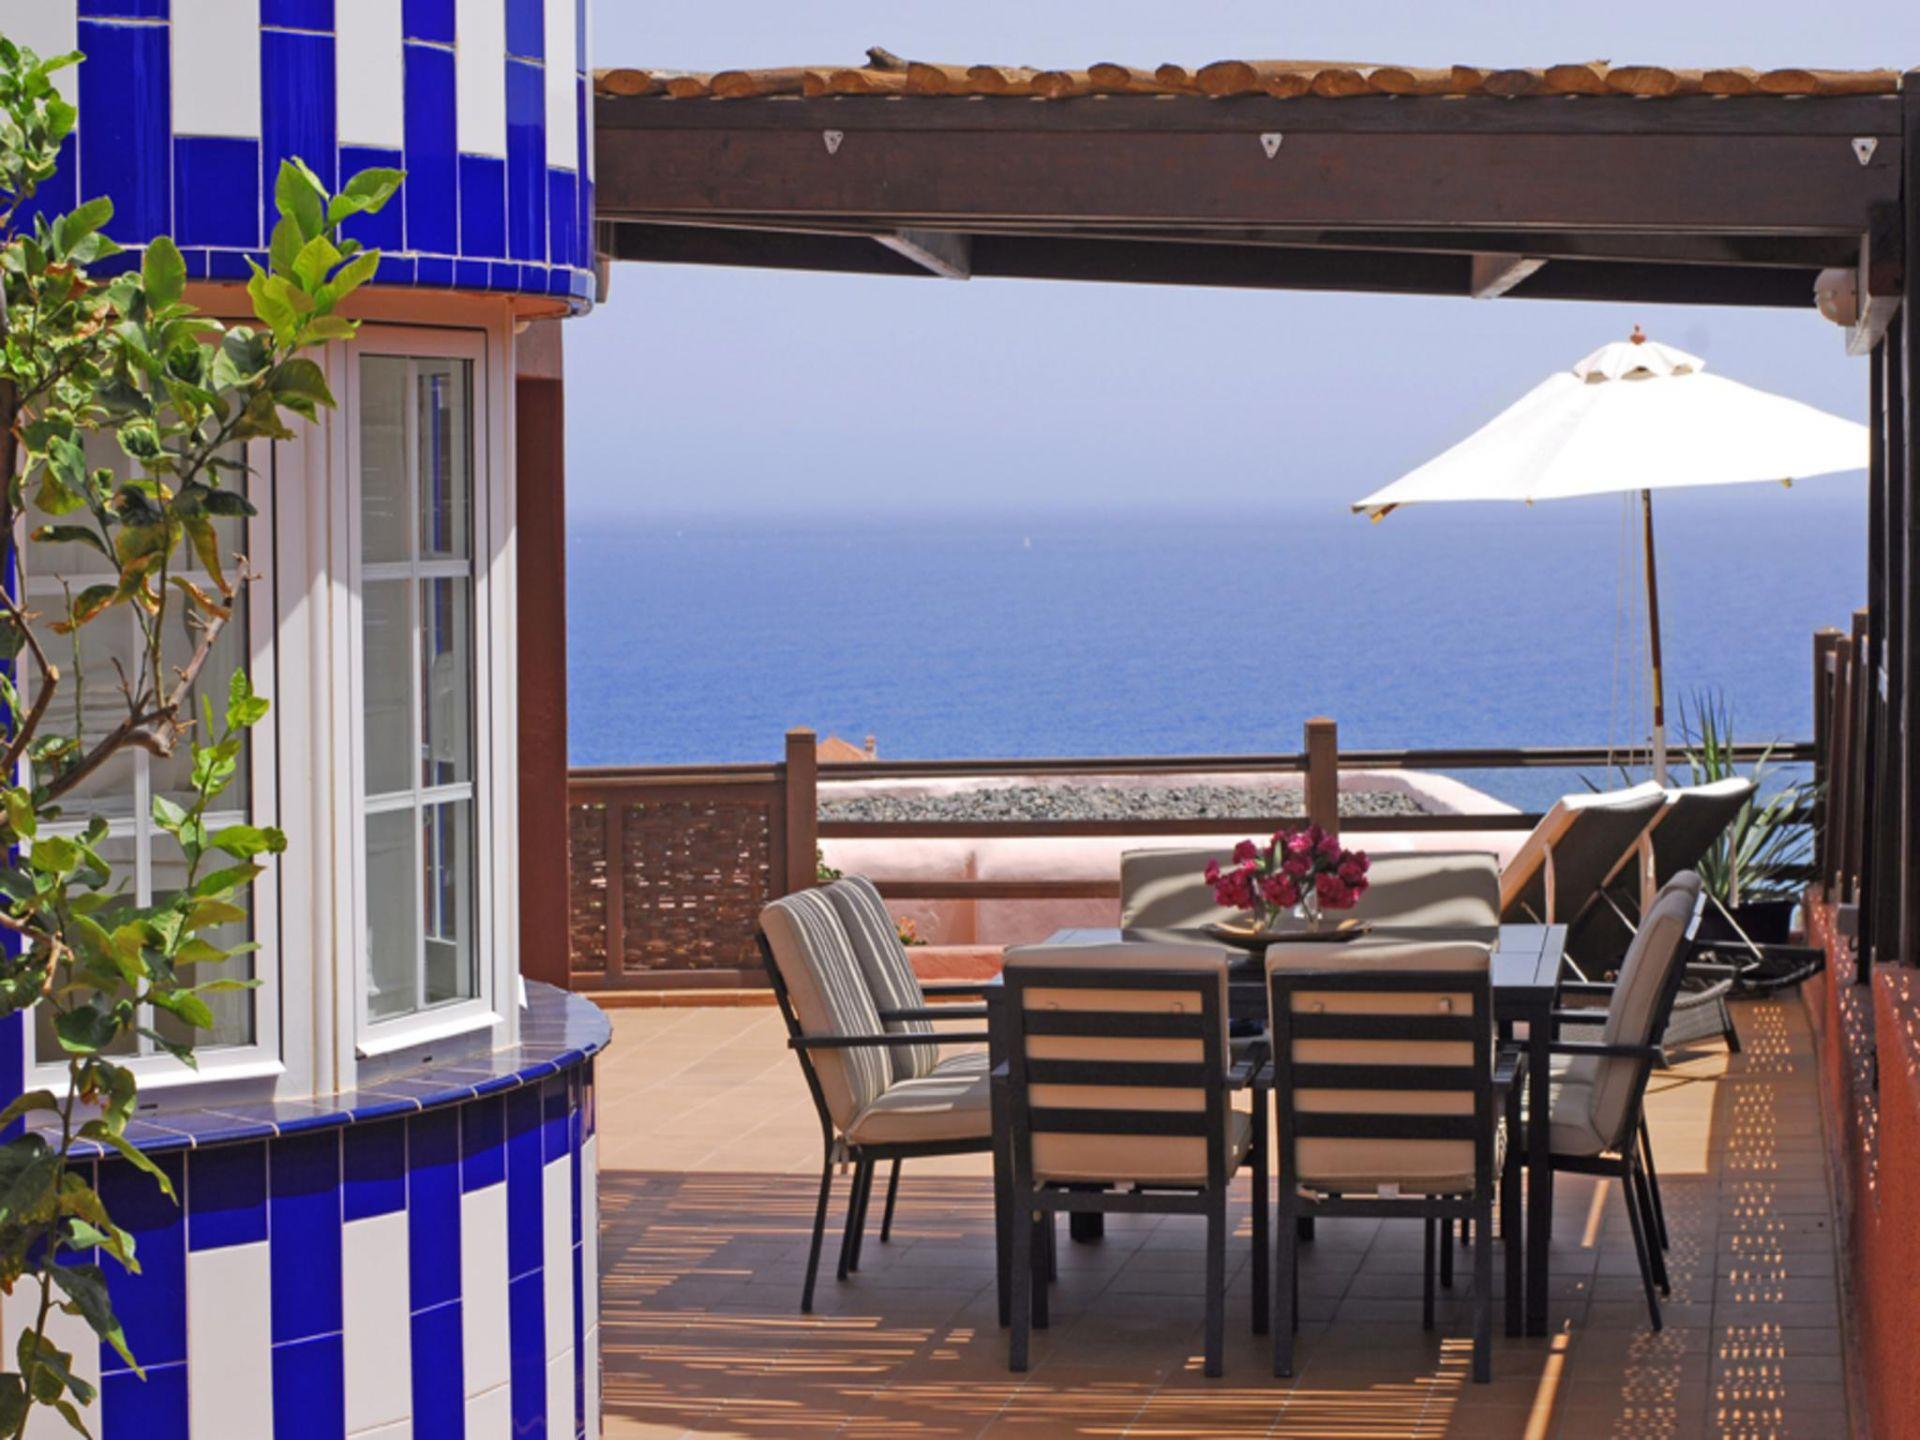 Holiday apartment Villa San Agustin 10 - Holiday Rental (854295), Maspalomas, Gran Canaria, Canary Islands, Spain, picture 1